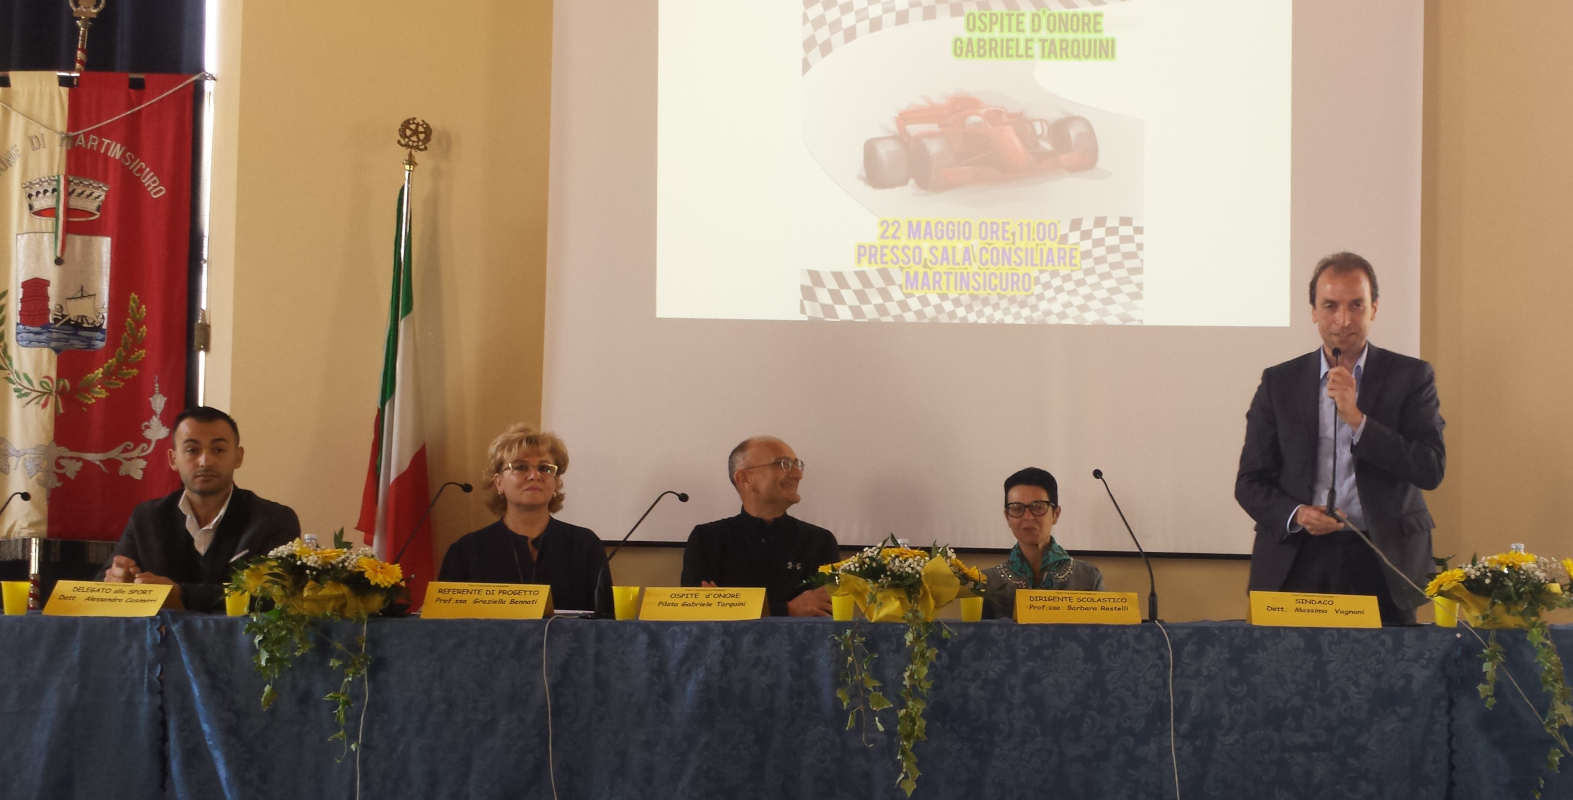 Gabriele Tarquini incontro Sala Consiliare Martinsicuro